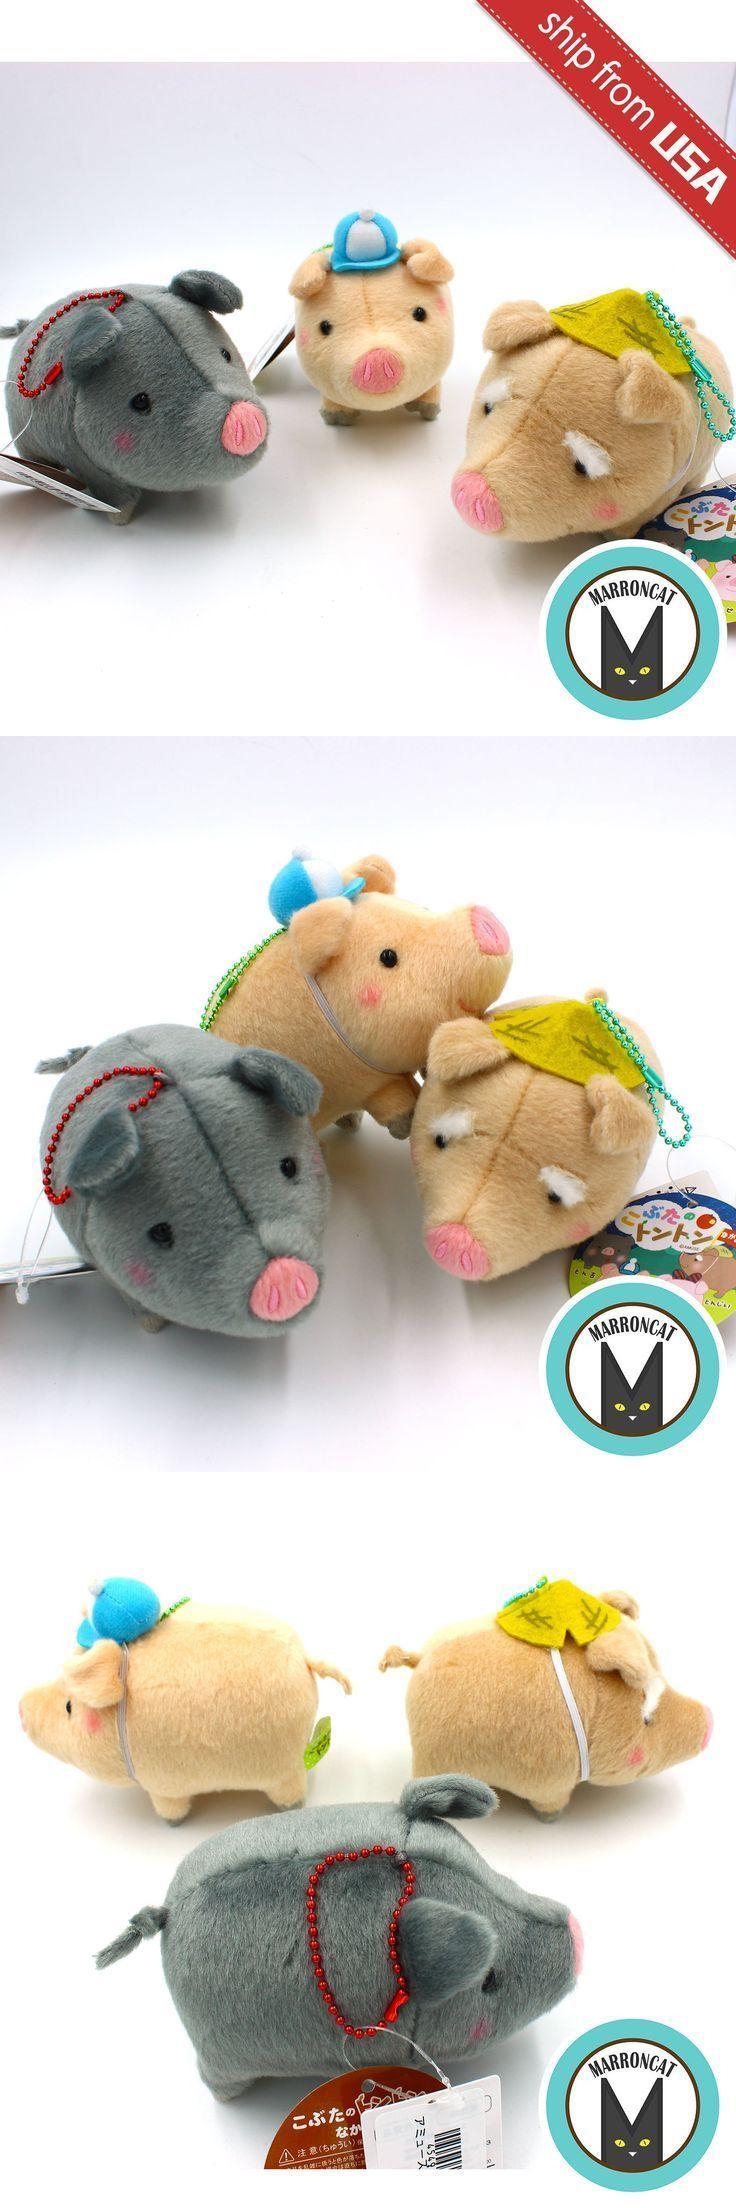 Pouf En Peluche 51030 Veritable Japon Amuse Kobuta No Ton Ton Pig P 5103 Pouf En Peluche 51030 Ve Pig Plush Monkey Stuffed Animal Big Stuffed Animal [ 2208 x 736 Pixel ]